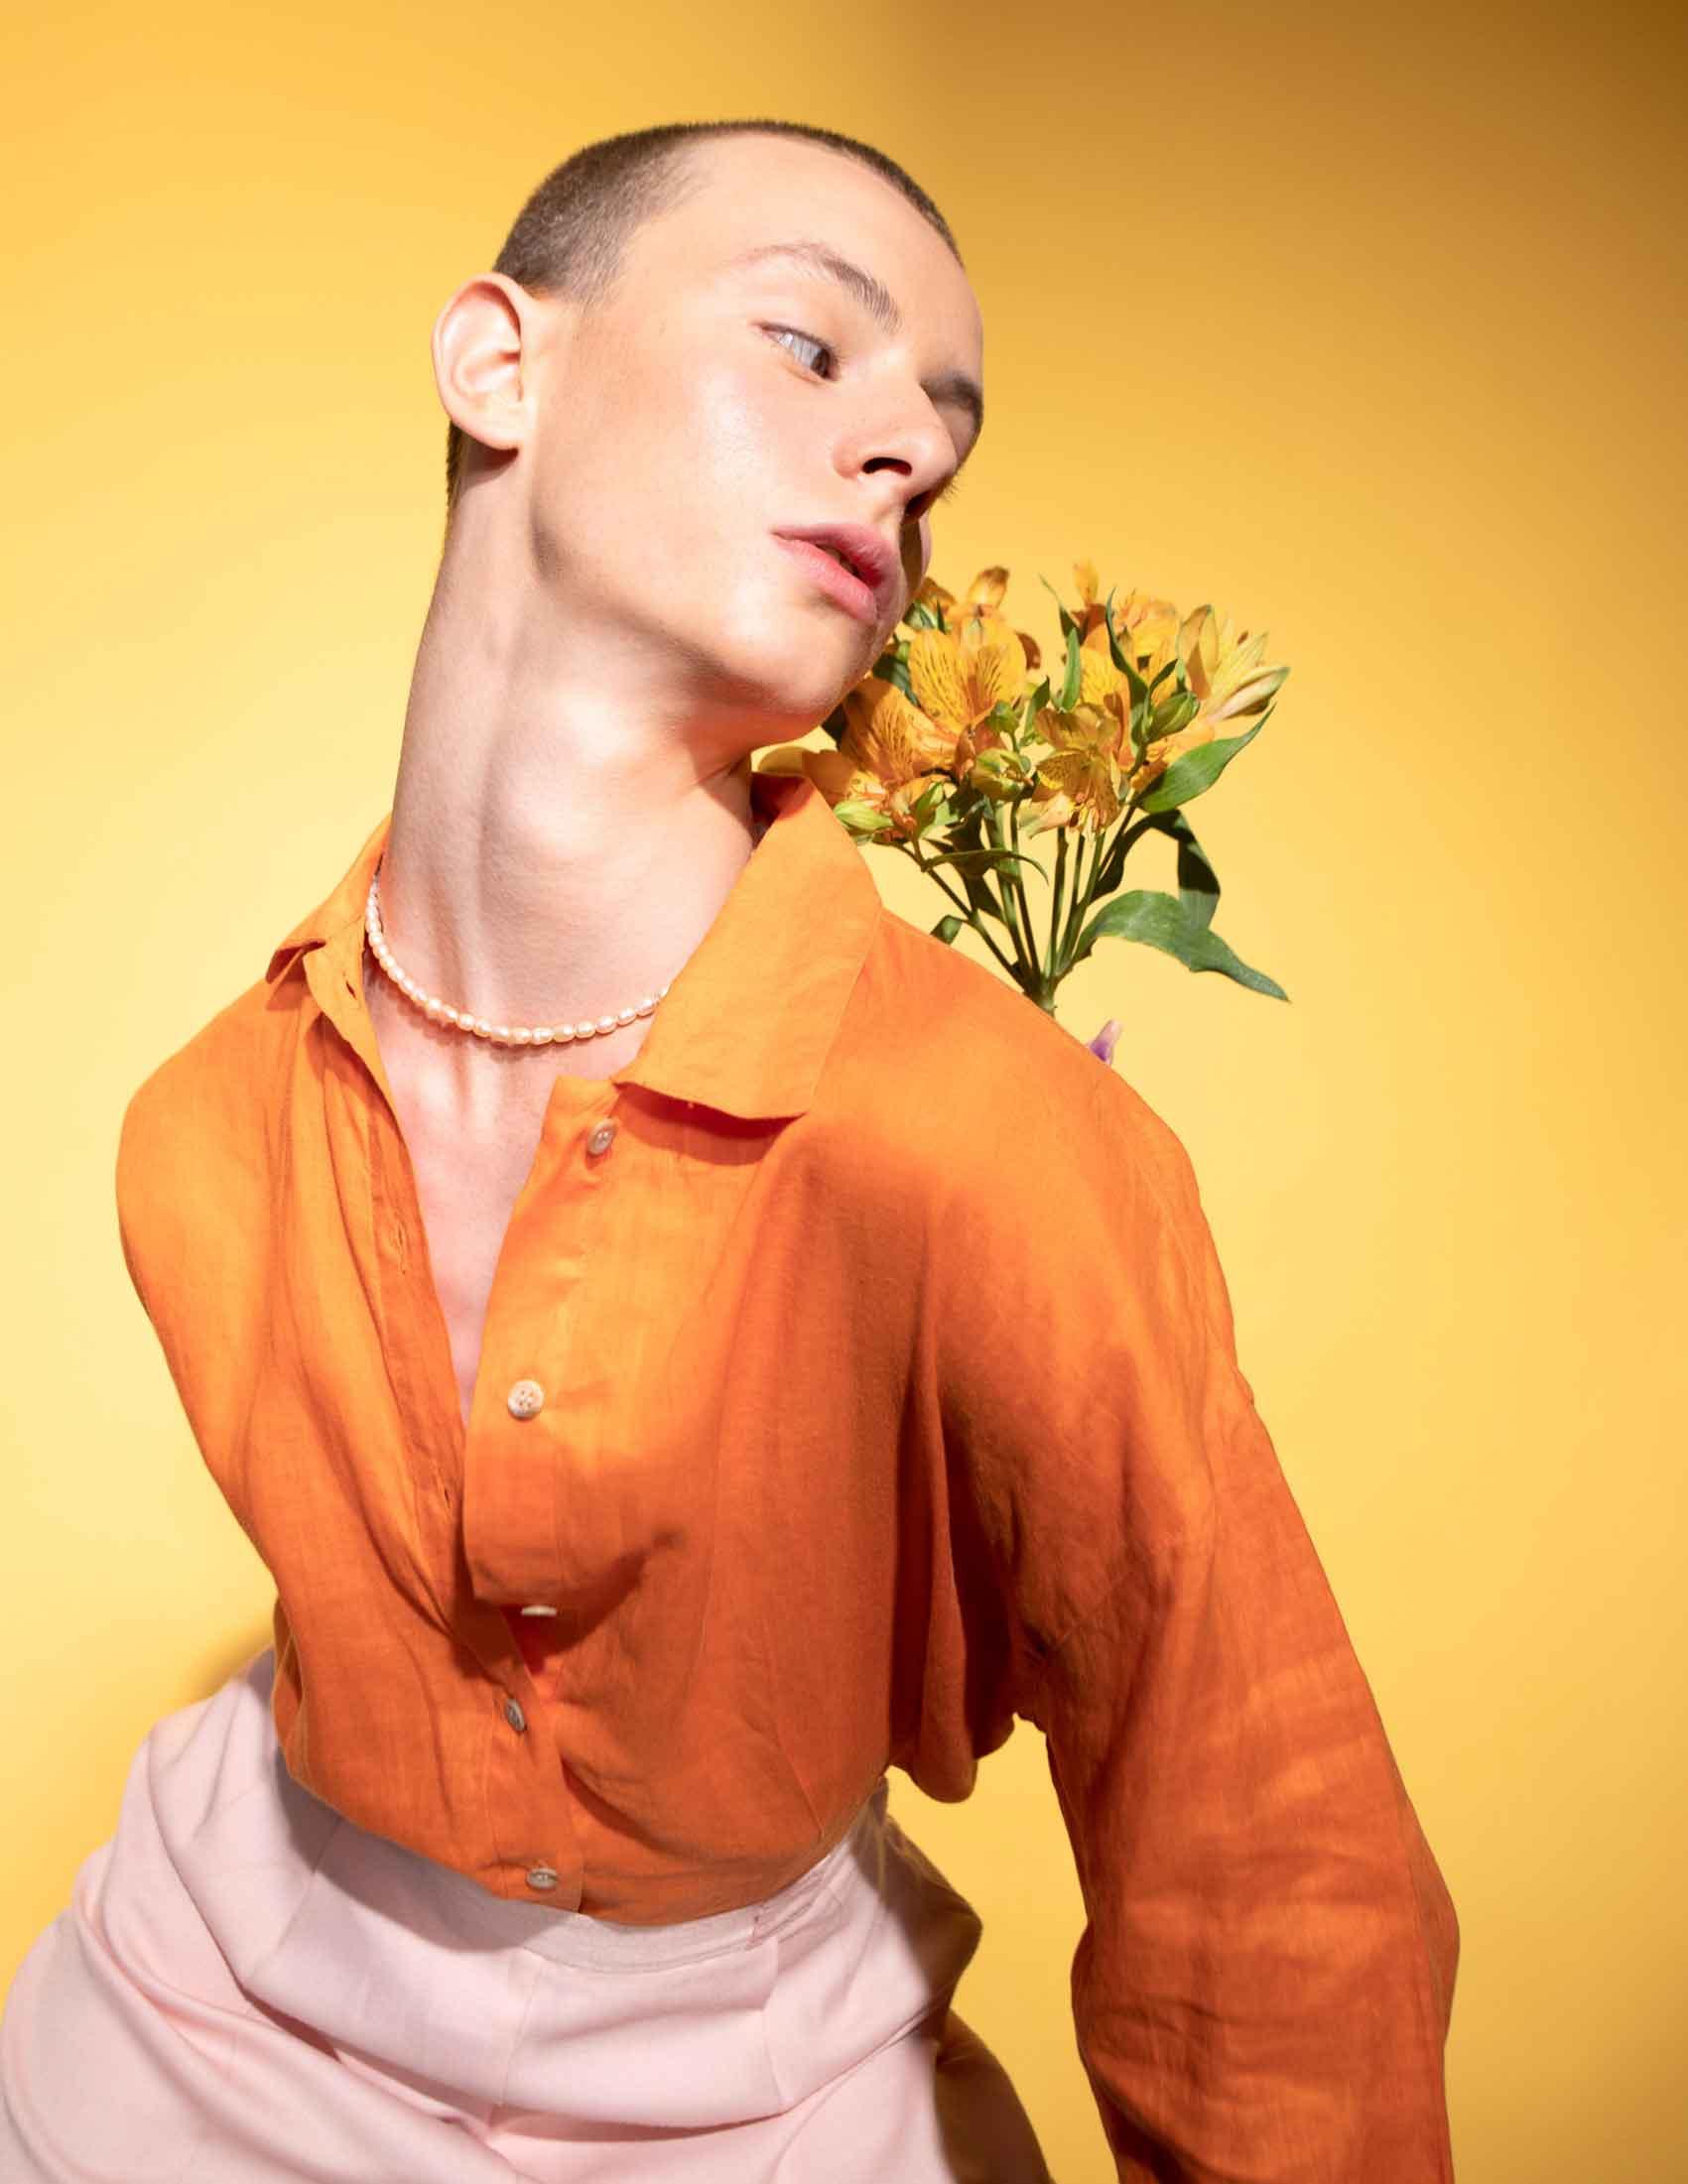 Photographer: Daniel Noy Dor Model: Idan Marin Stylist: Maayan Naftali Makeup: Roni Ben Ami Assistant: Tomer Hershkovitz-2